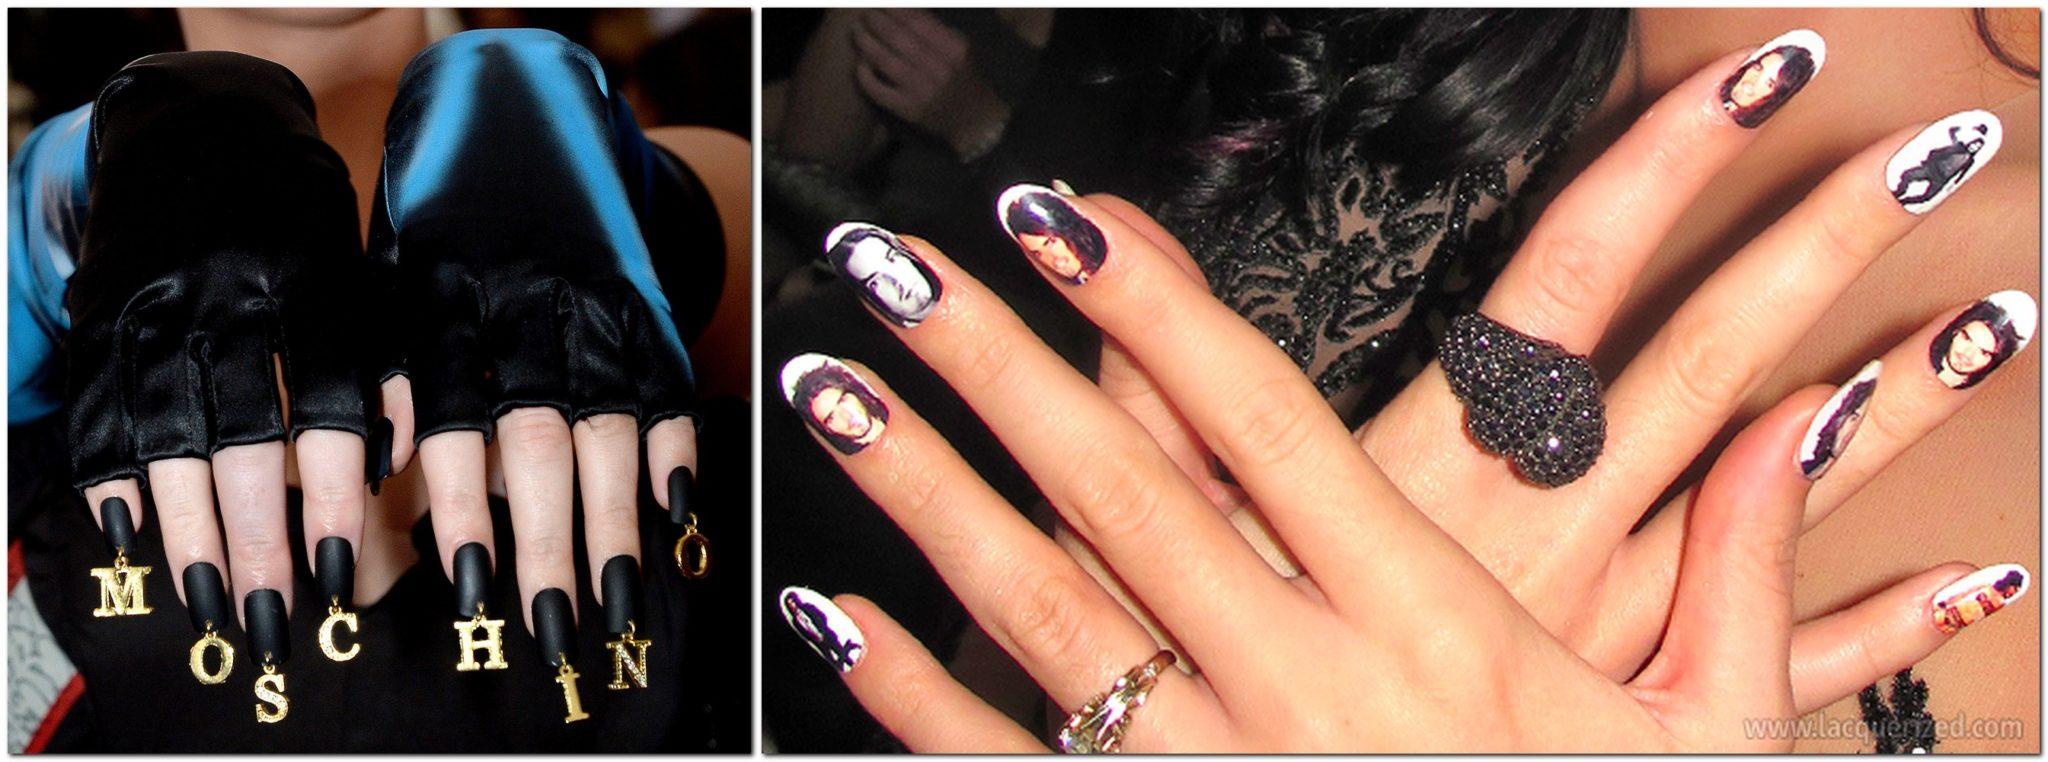 celebs-expensive-manicure-9-5